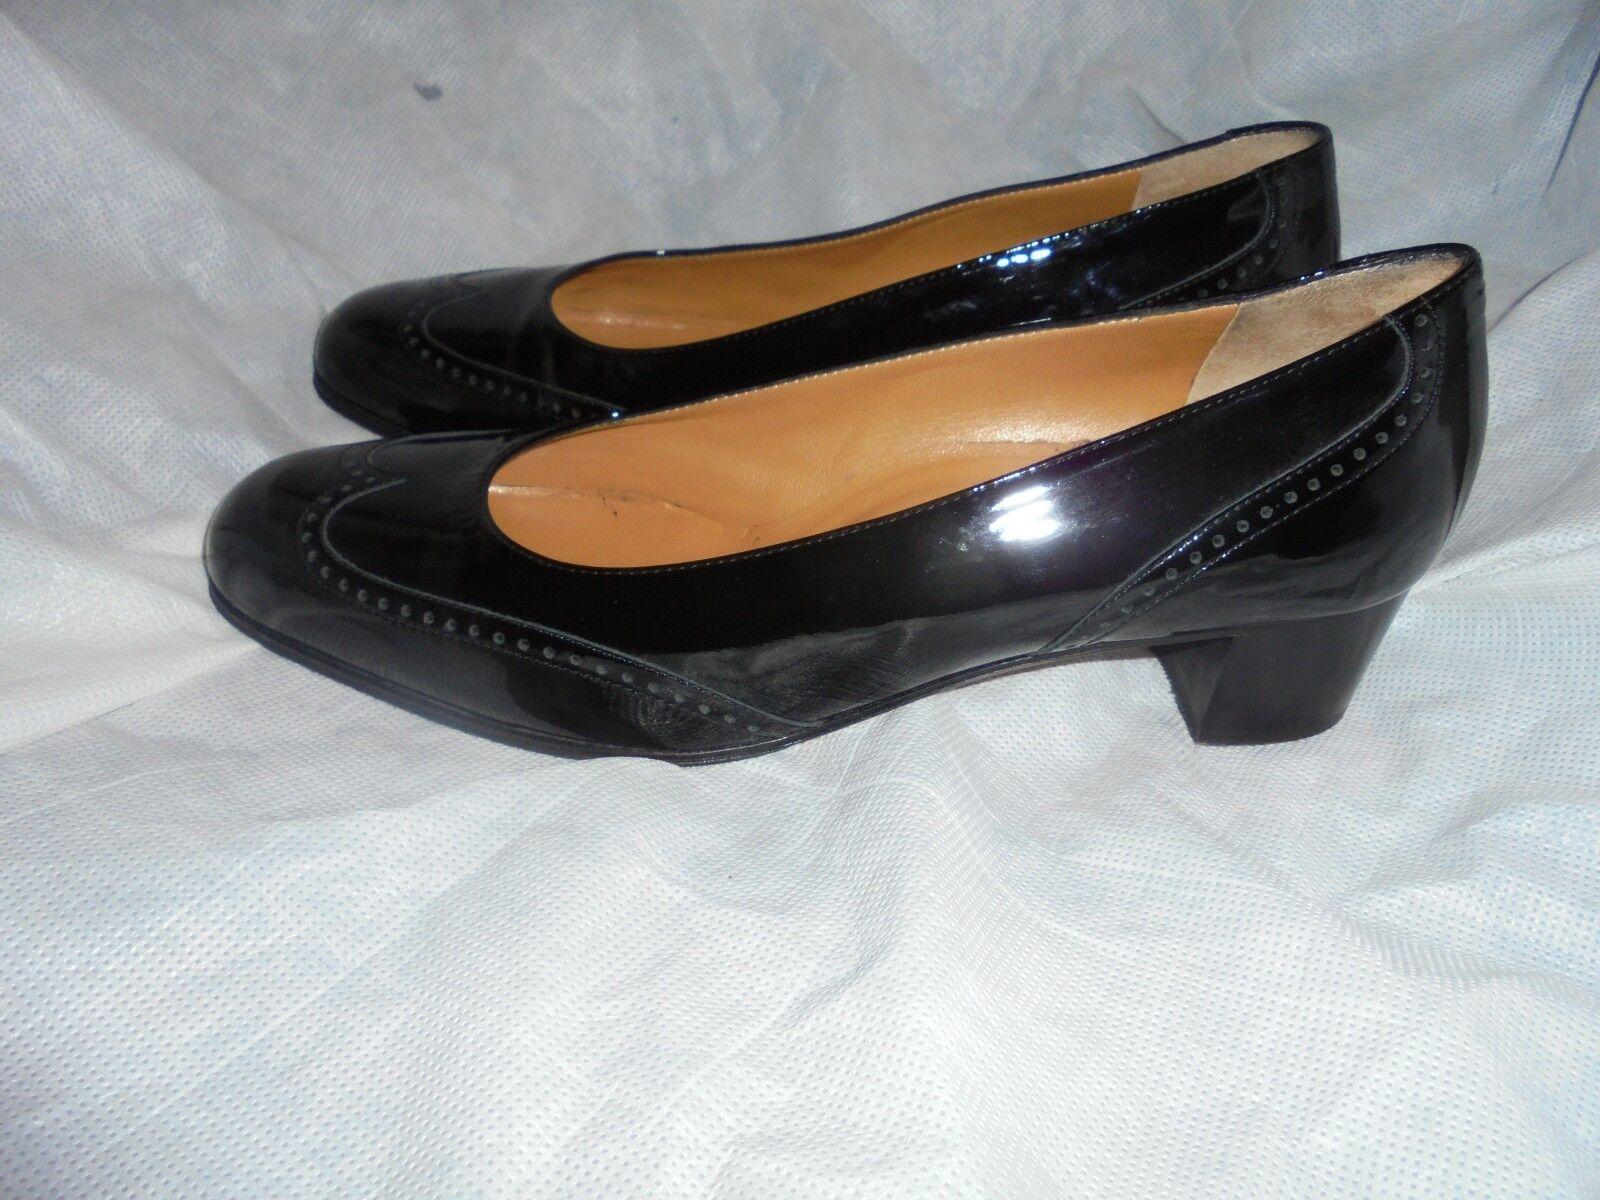 DENKSTEIN WOMEN BLACK LEATHER SLIP ON BROGUES Schuhe SIZE UK 6 EU 39 VGC